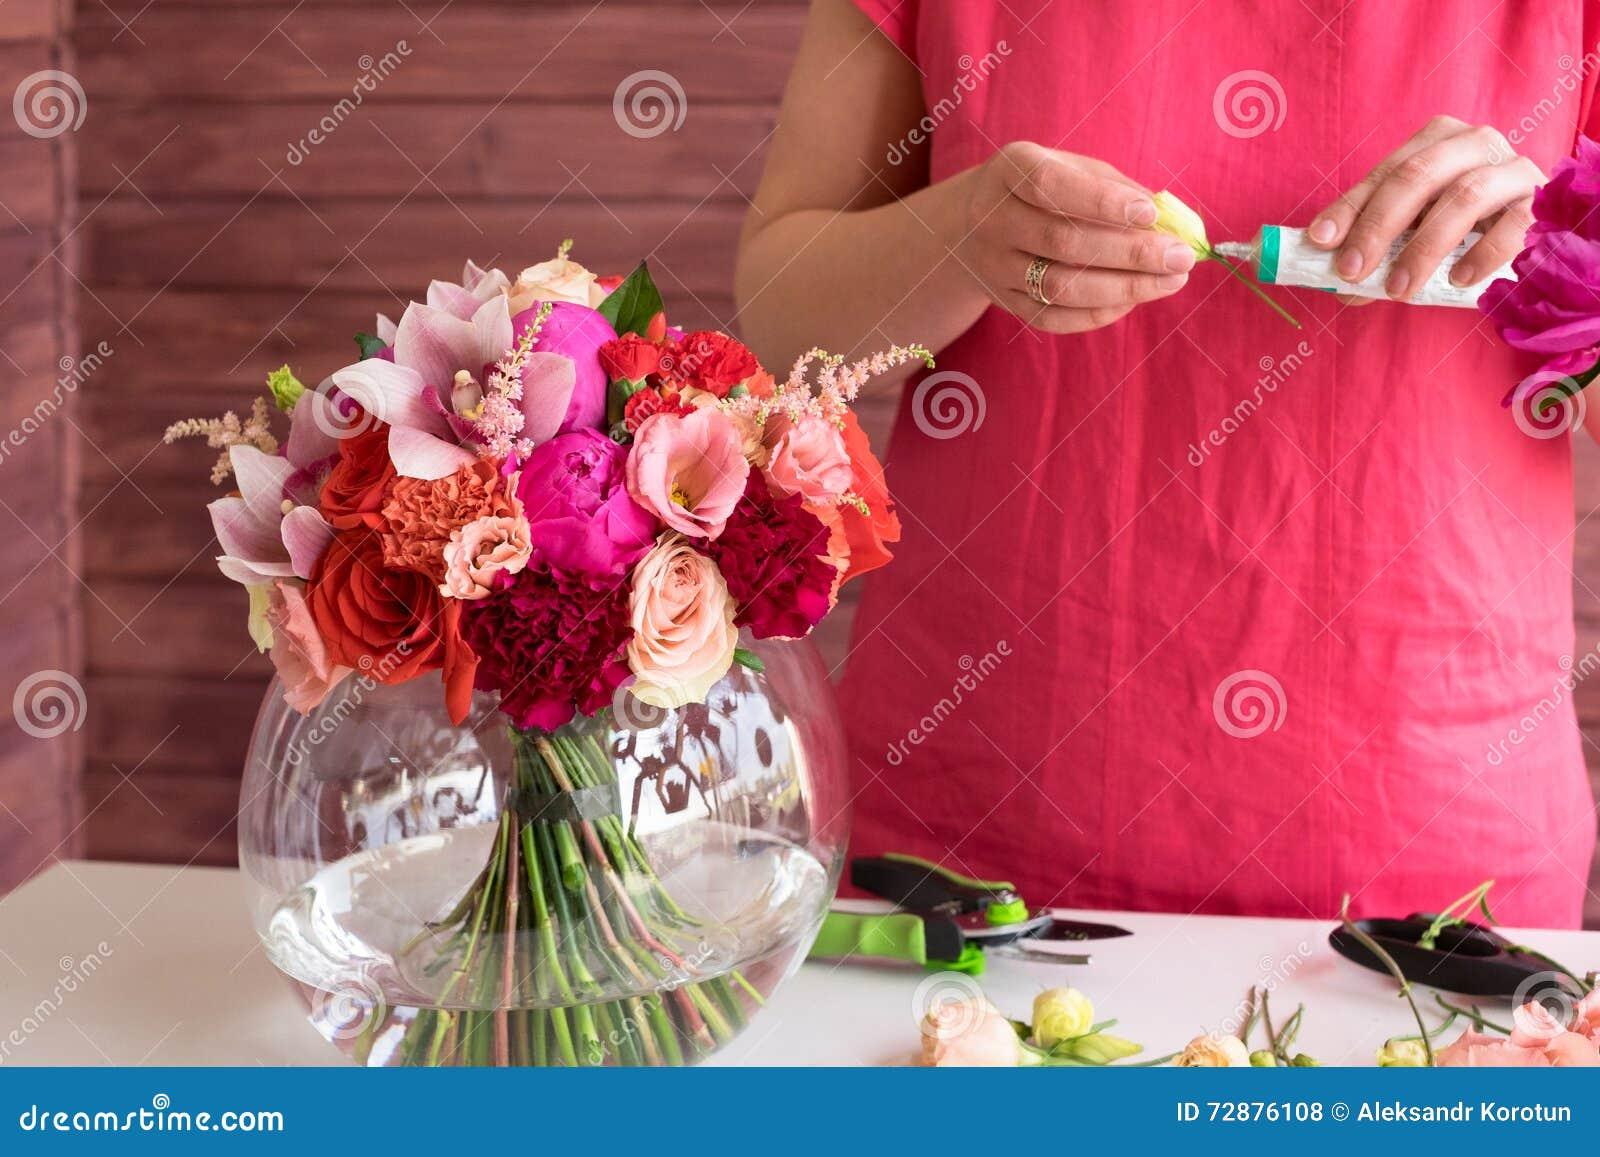 Girl Florist Making A Wedding Bouquet Stock Photo - Image of florist ...